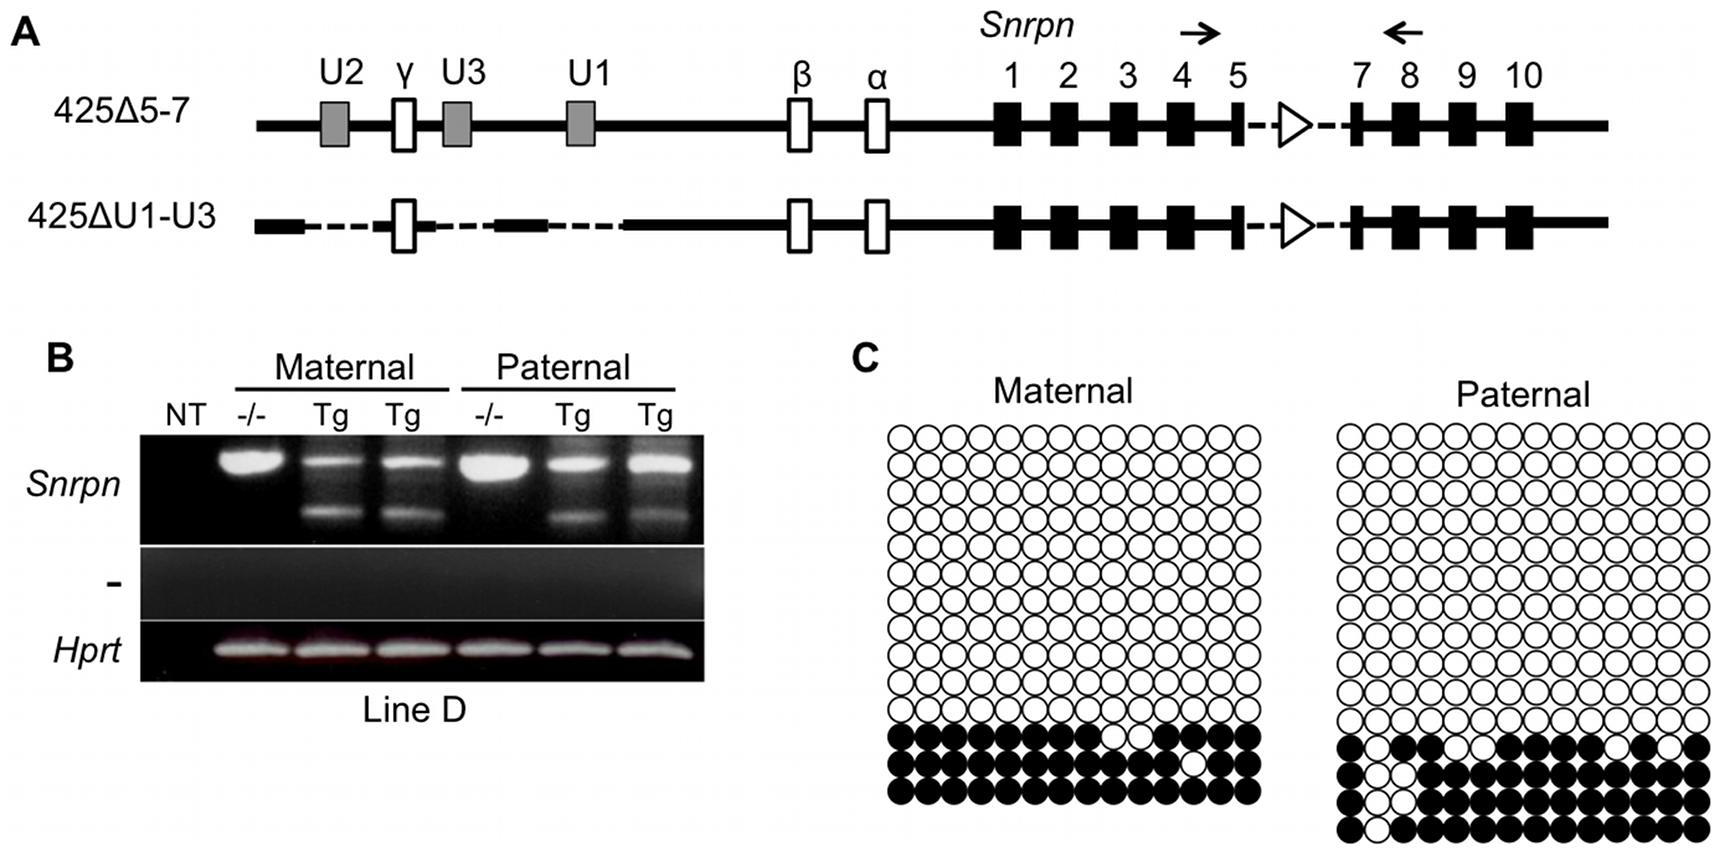 Analysis of imprinting of the 425ΔU1-U3D BAC transgene.